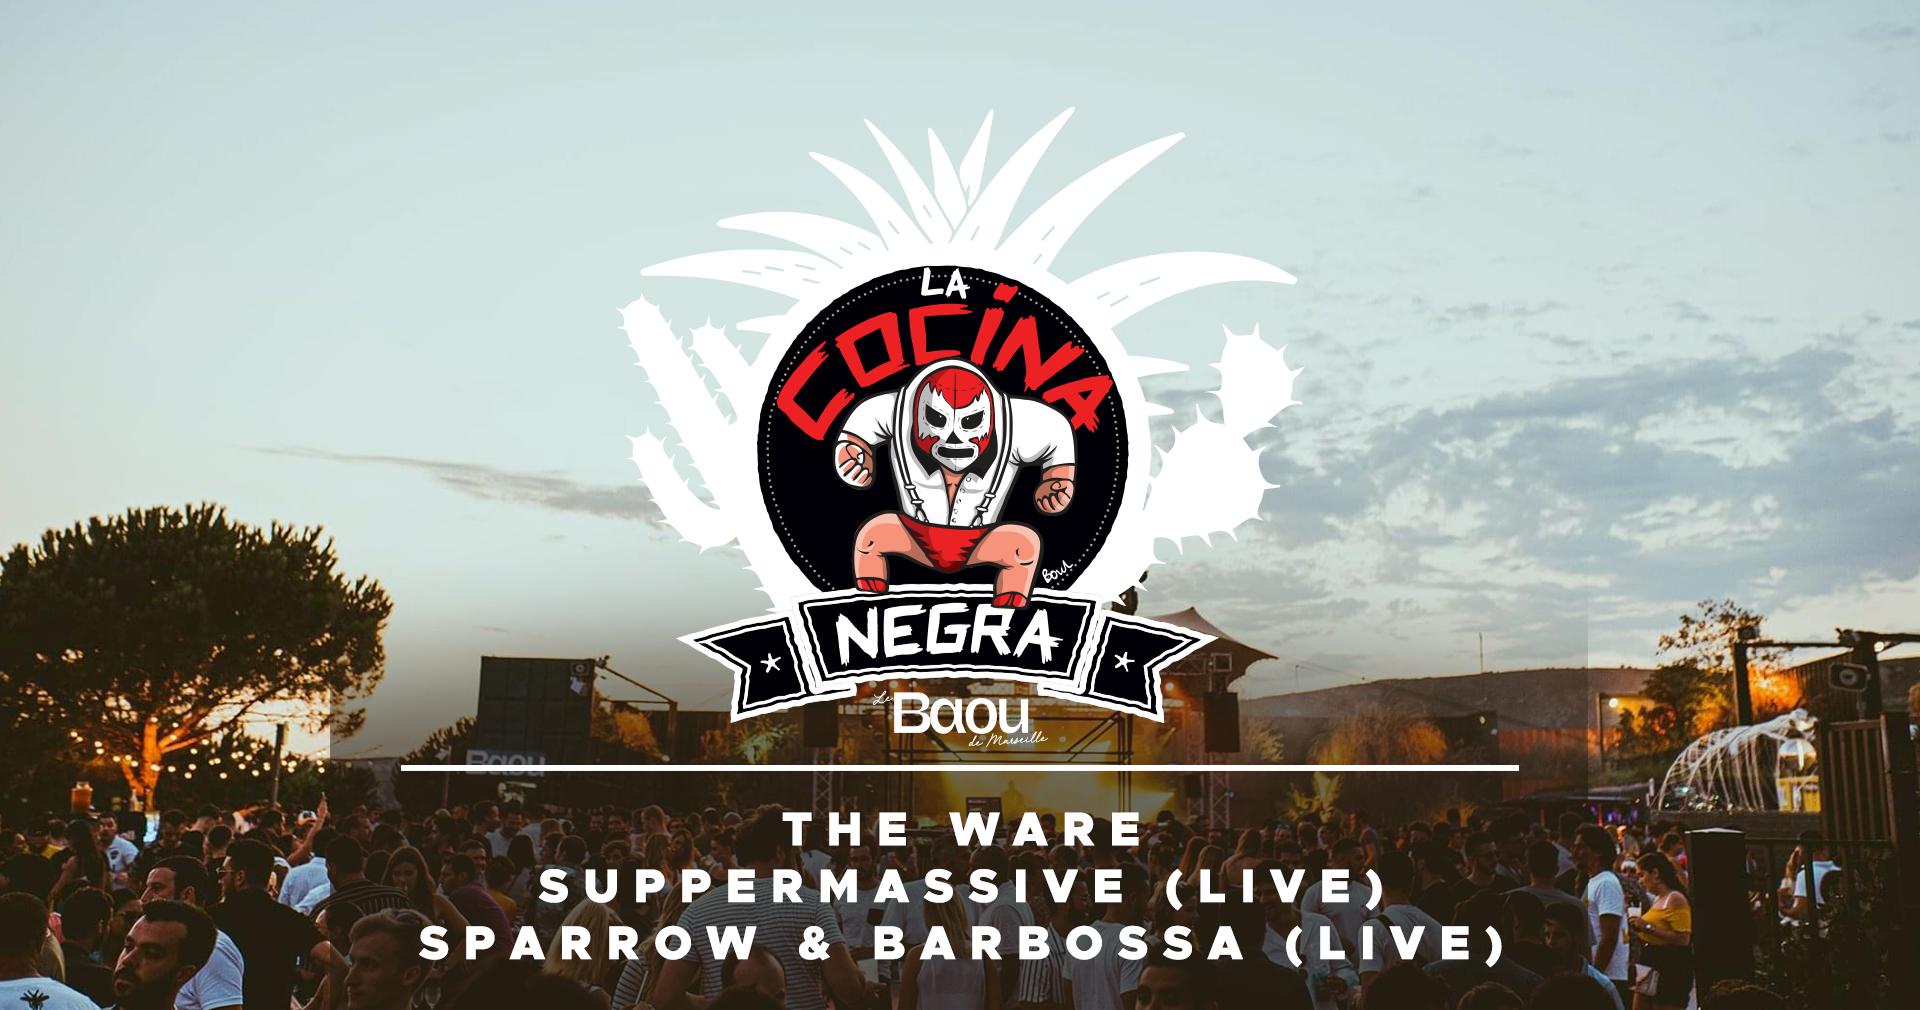 La Cocina Negra : The ware / Supermassive / Sparrow&Barbossa